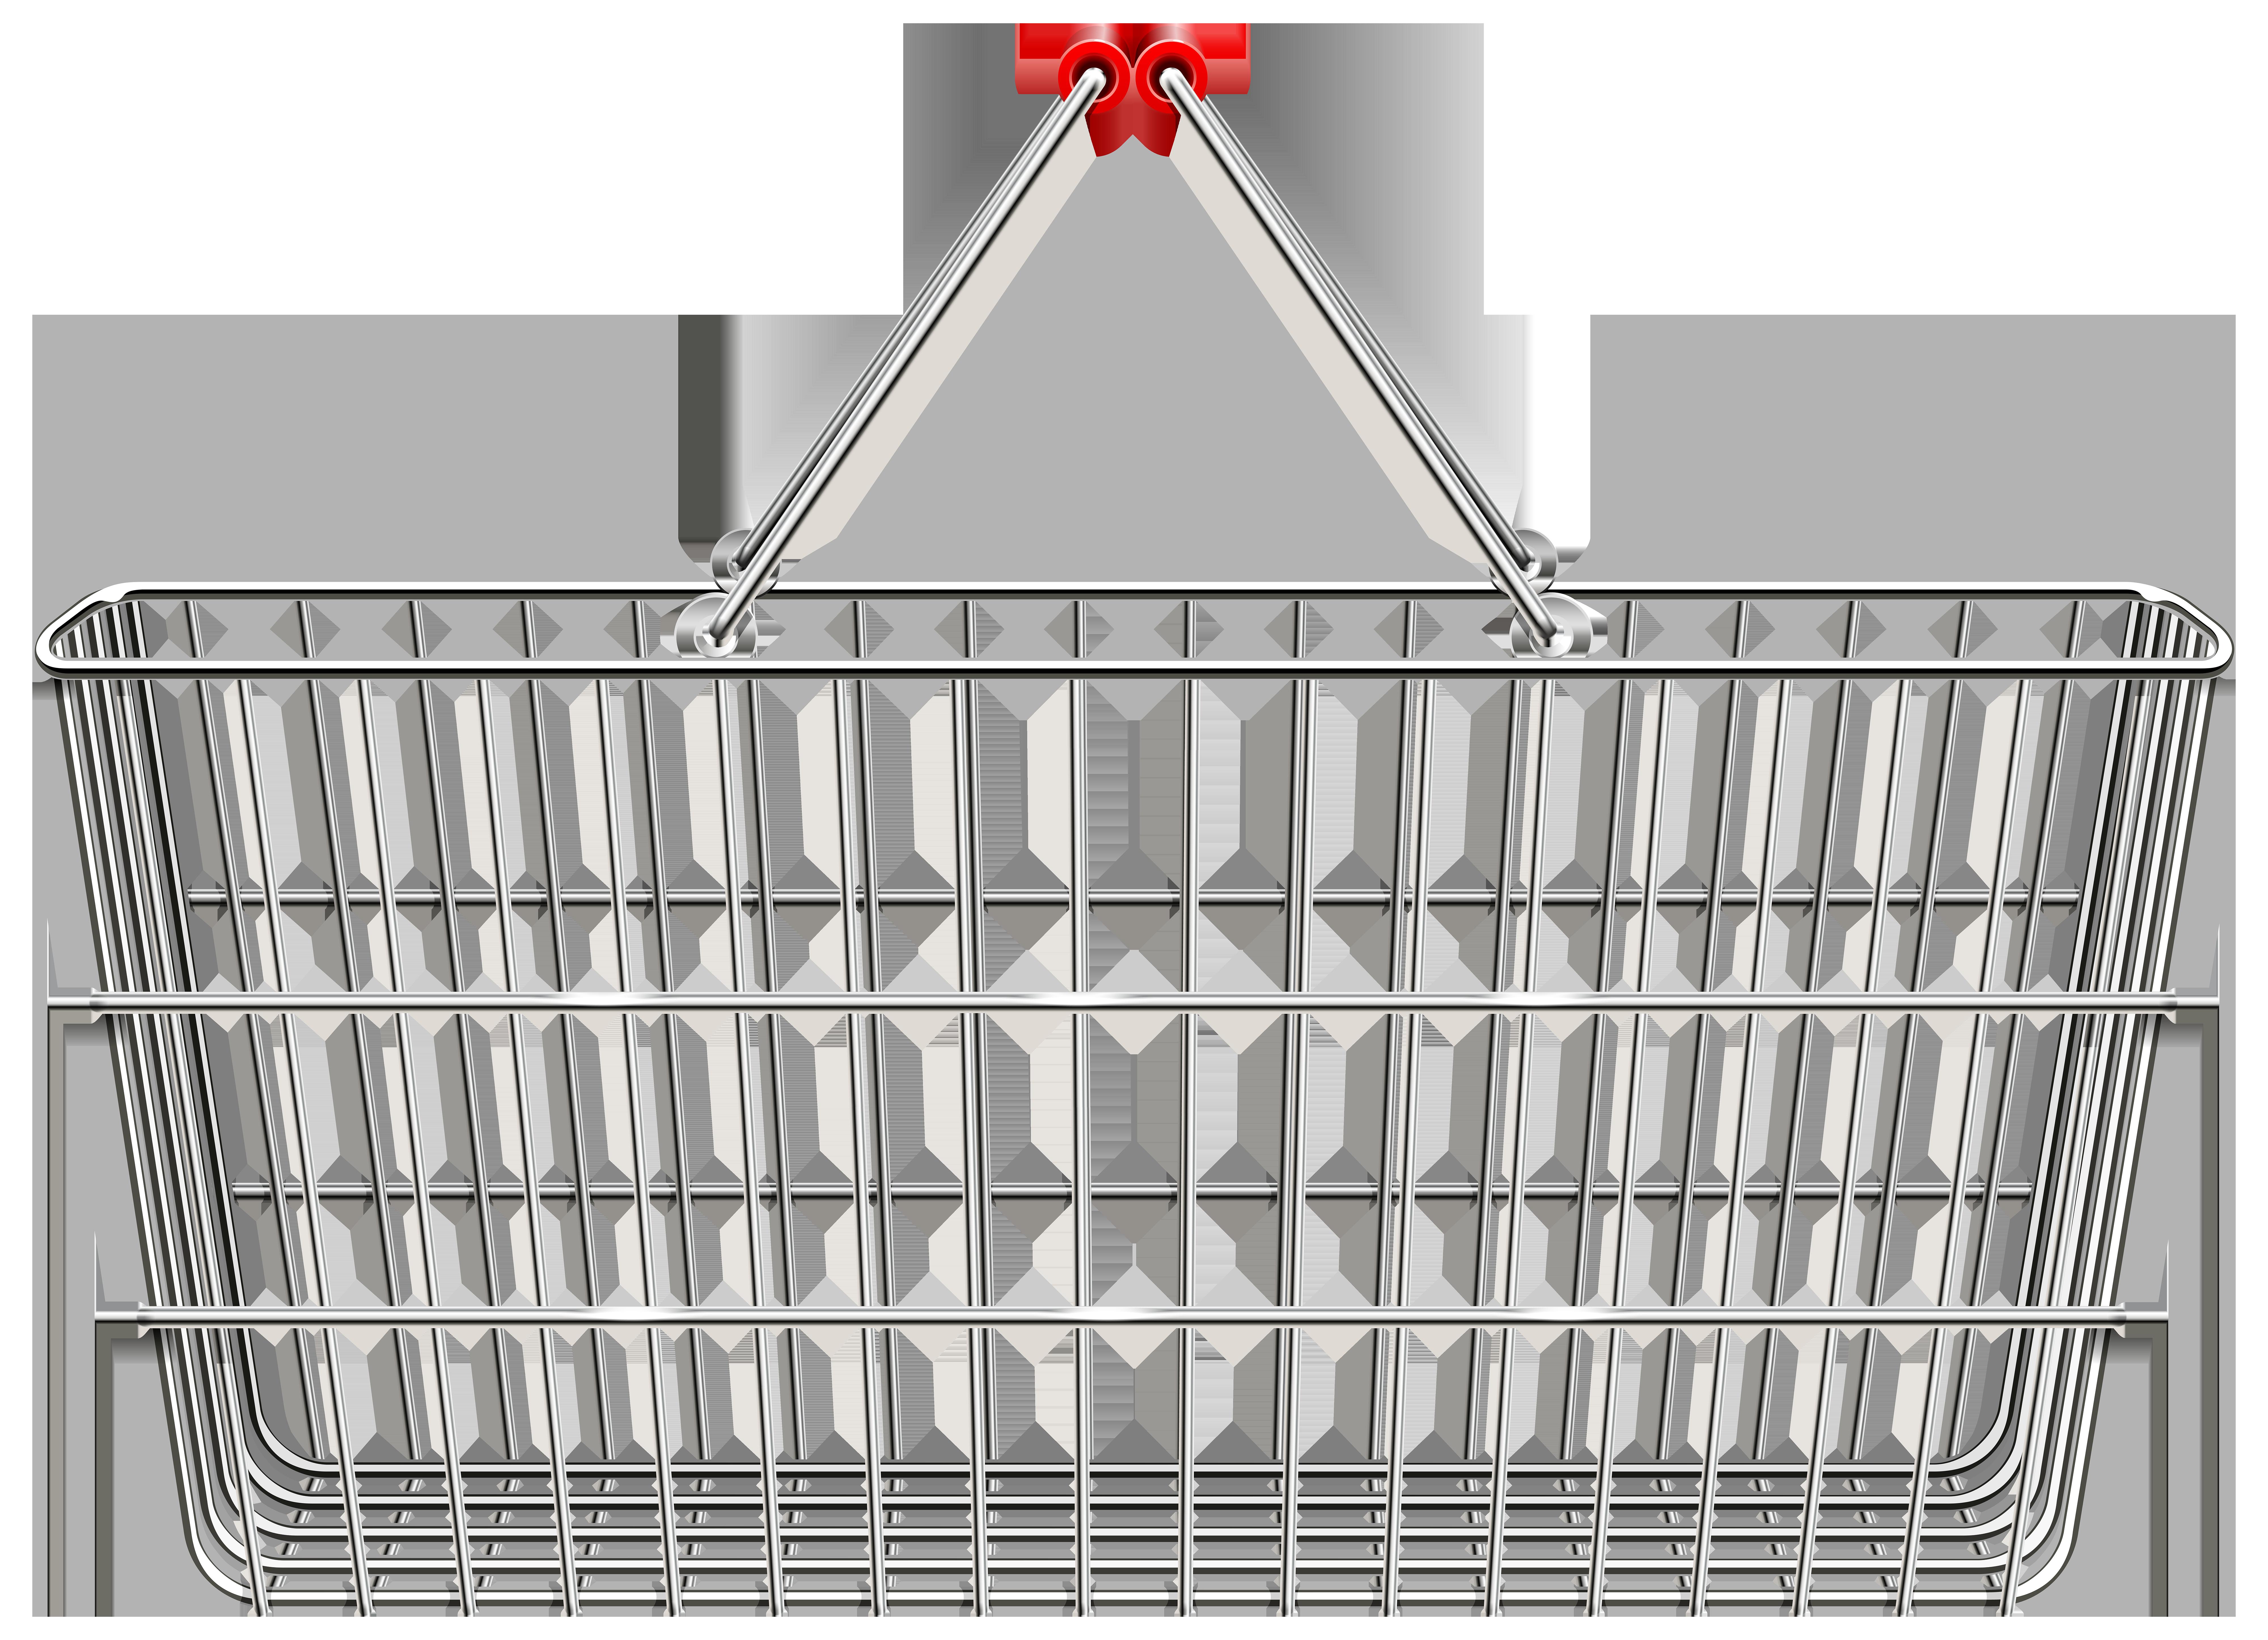 Shopping Basket PNG Transparent Clip Art Image.